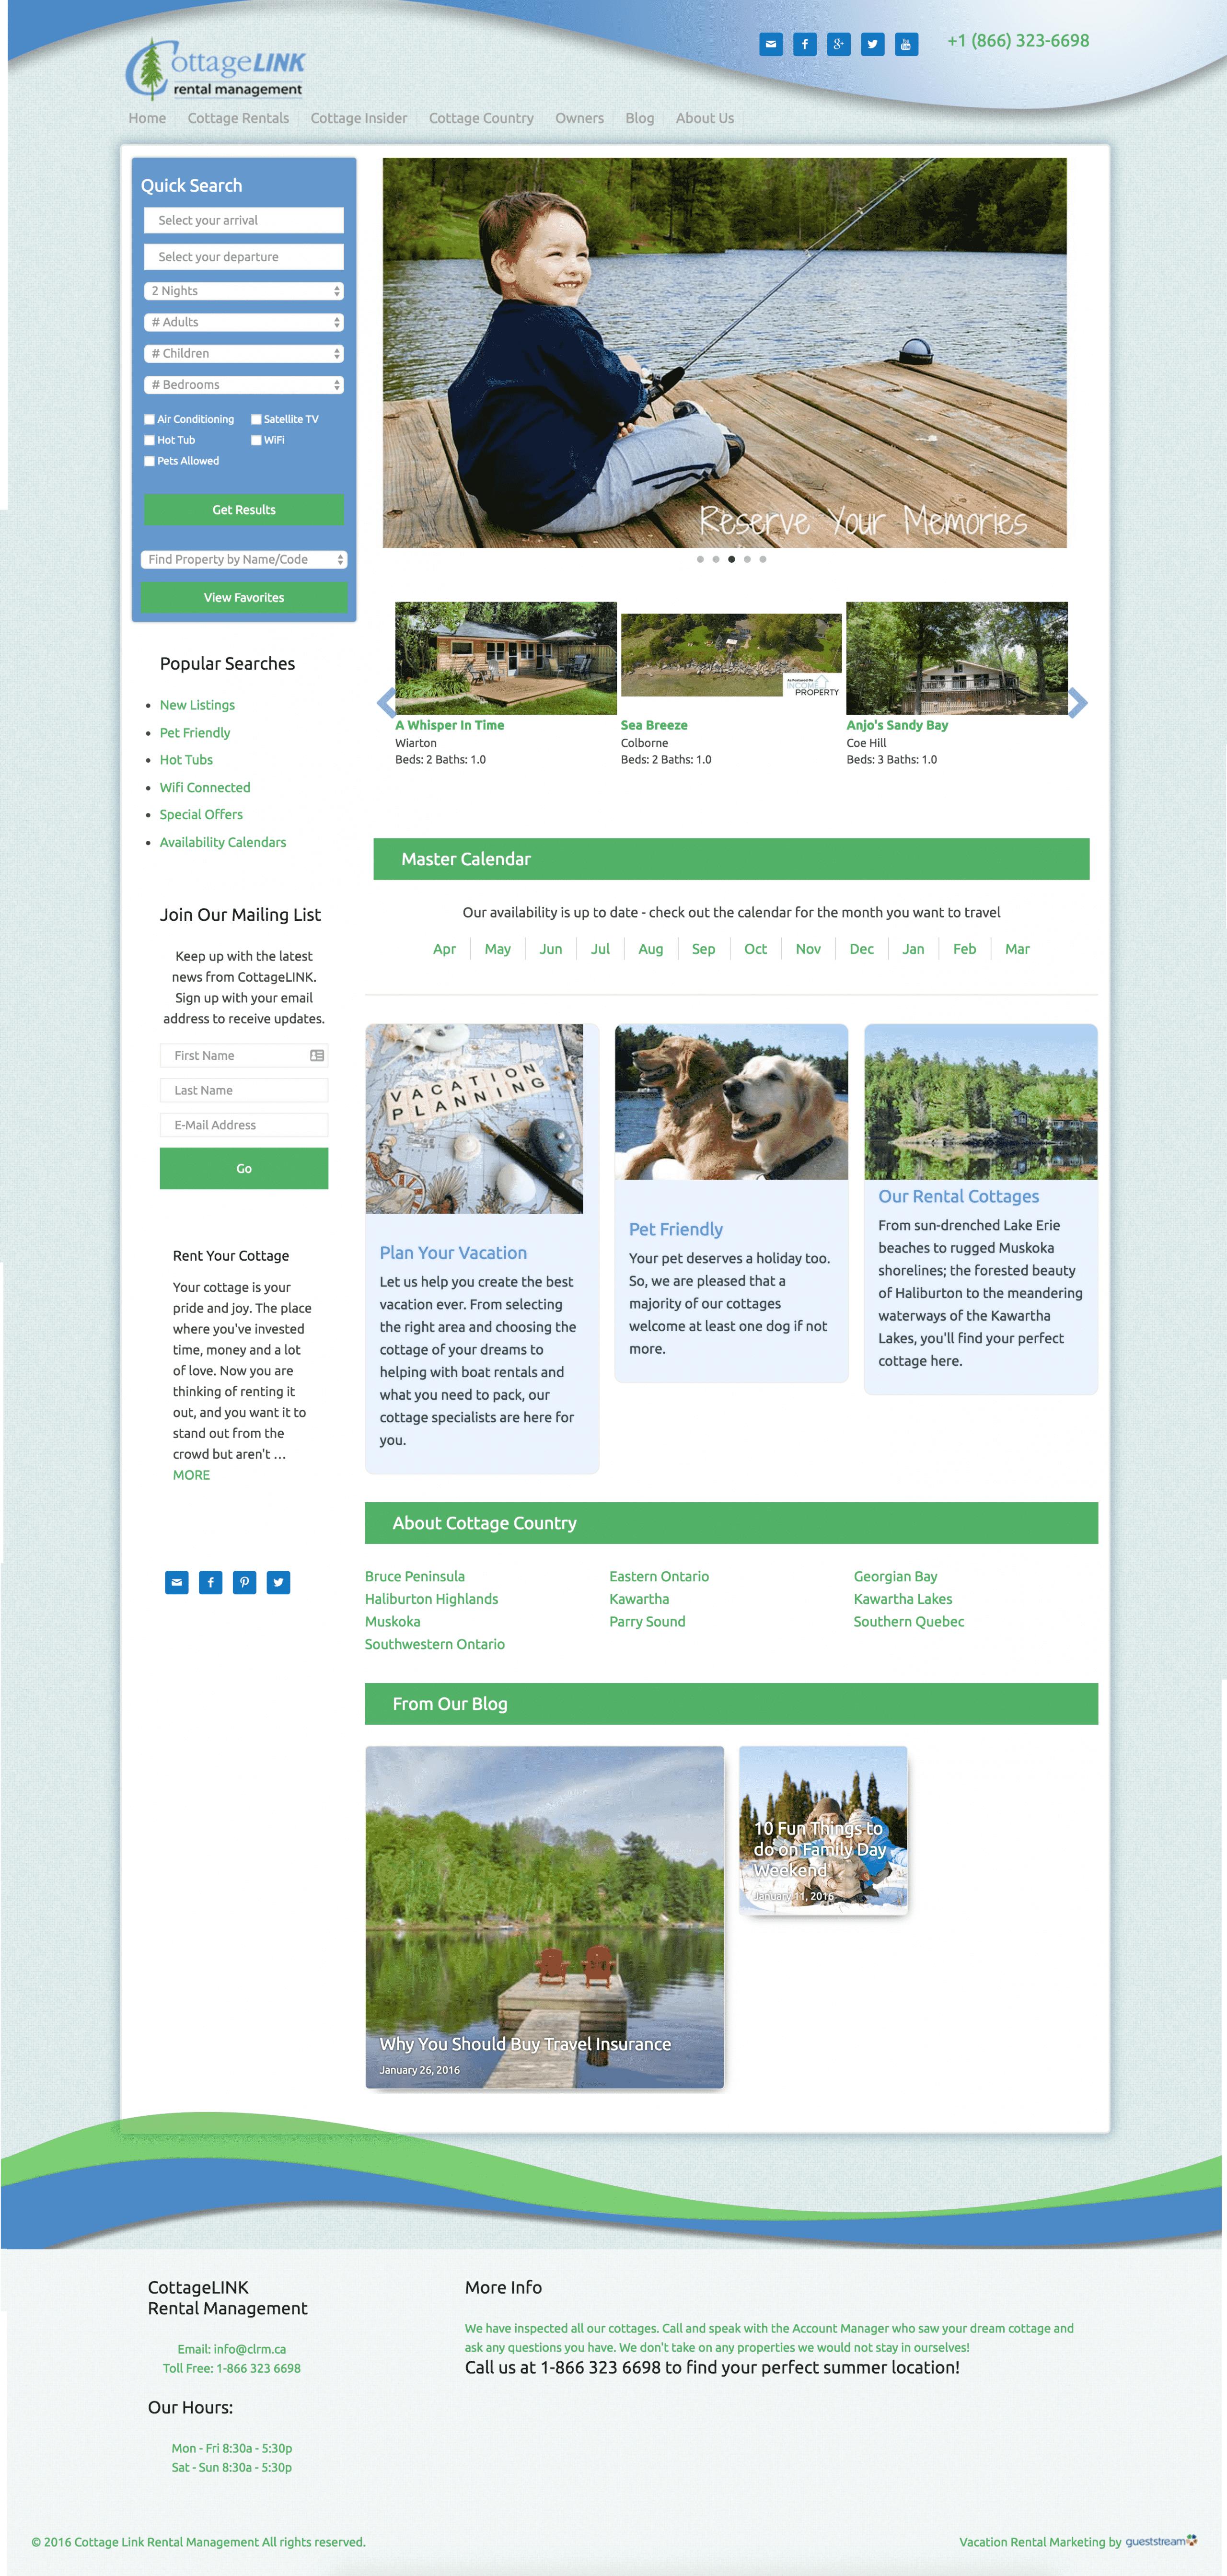 cottagelink_1.2_Homepage